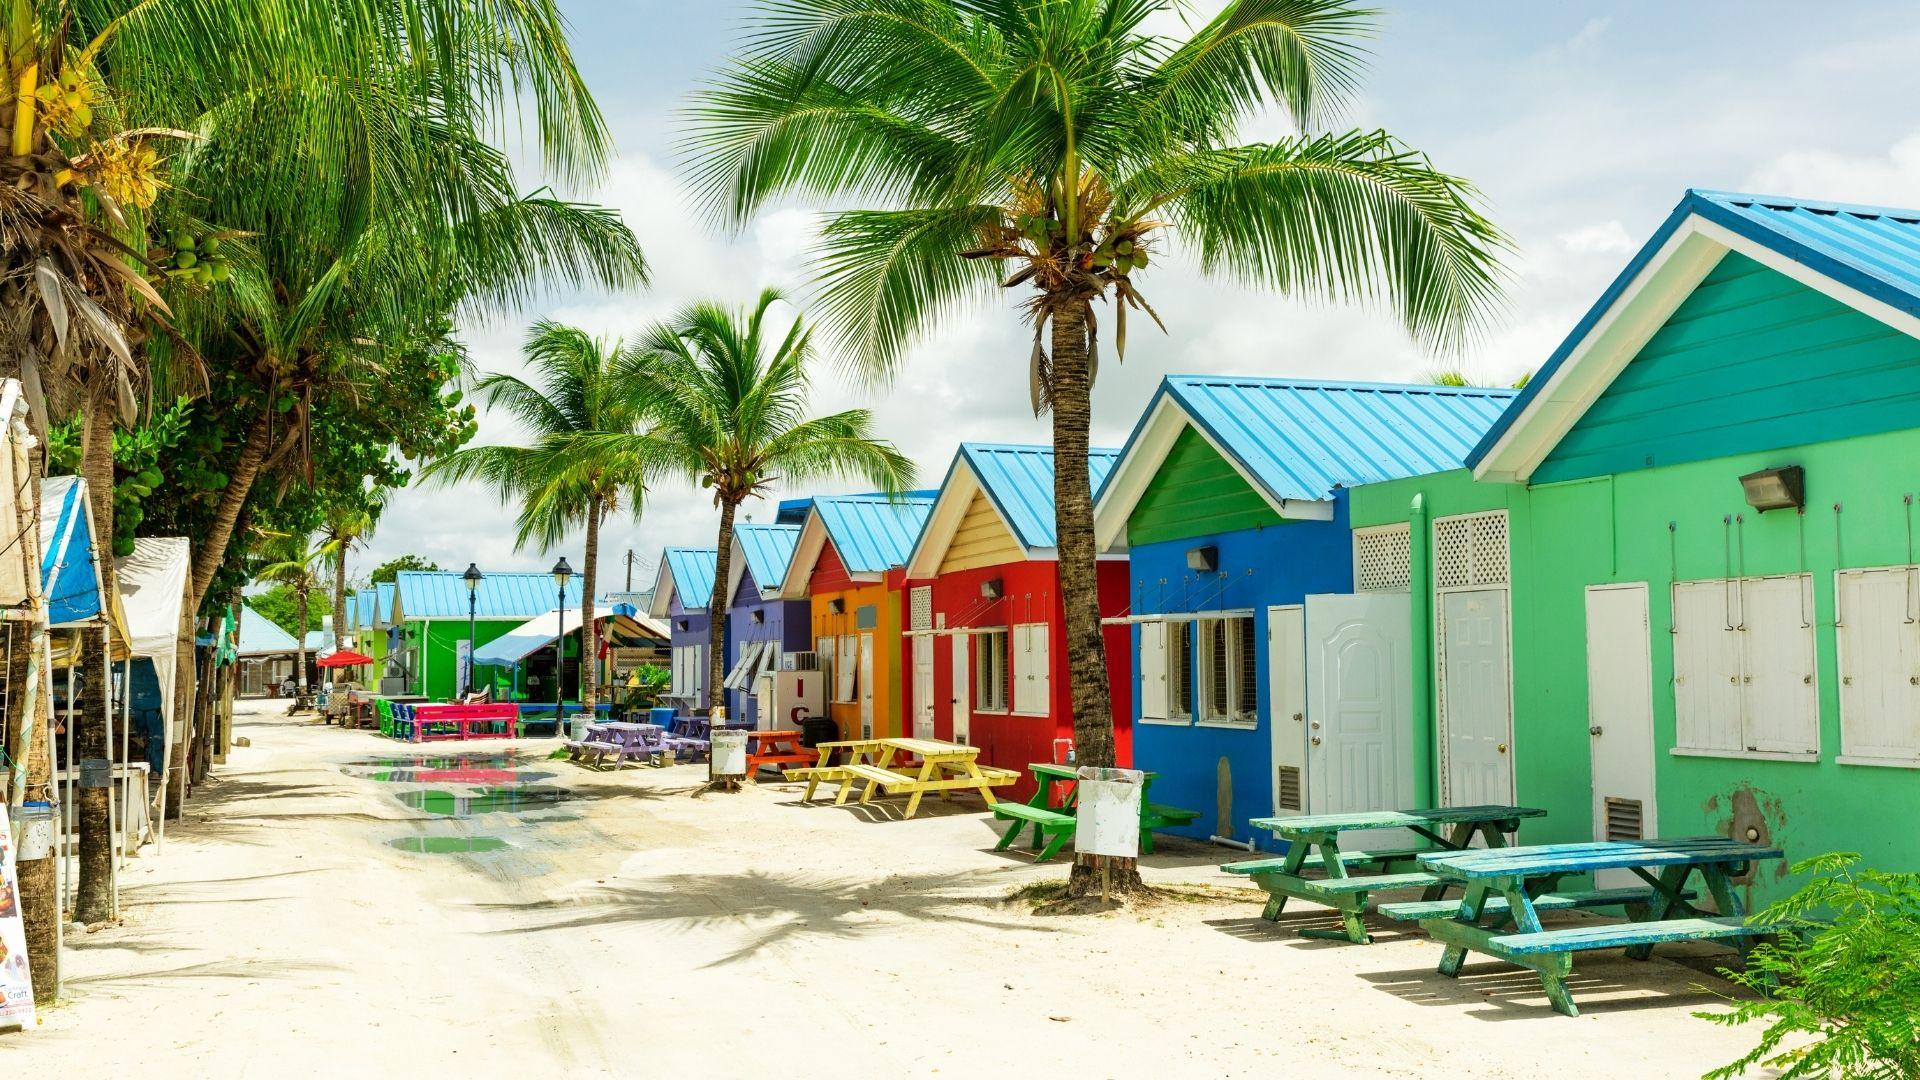 Karibikstrand mit Hütten